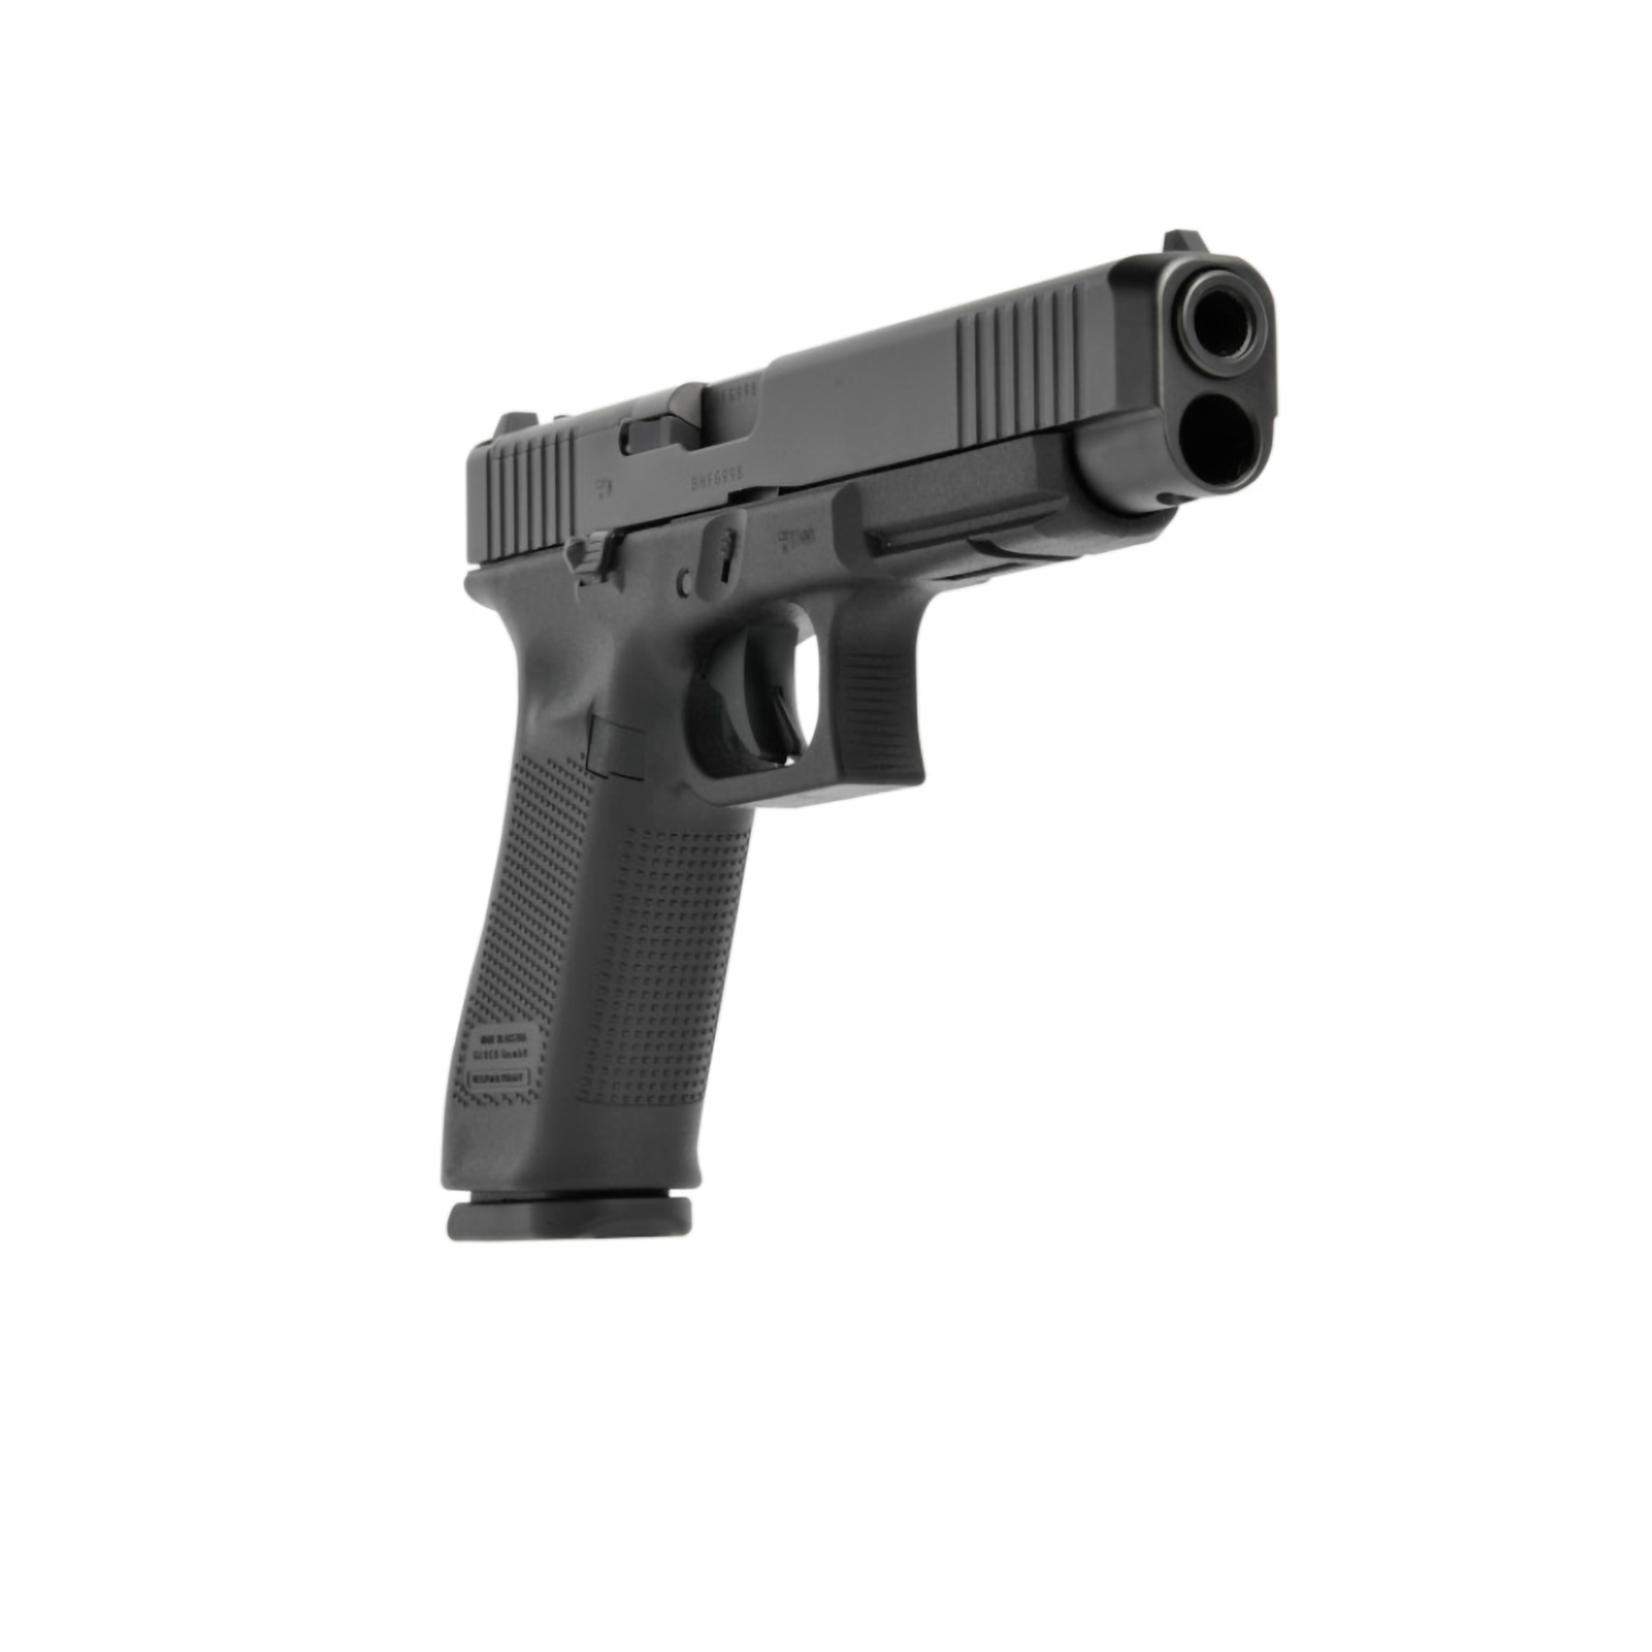 Glock 34 Gen 5 MOS 9mm Adjustable Sight w/ 3 Magazines